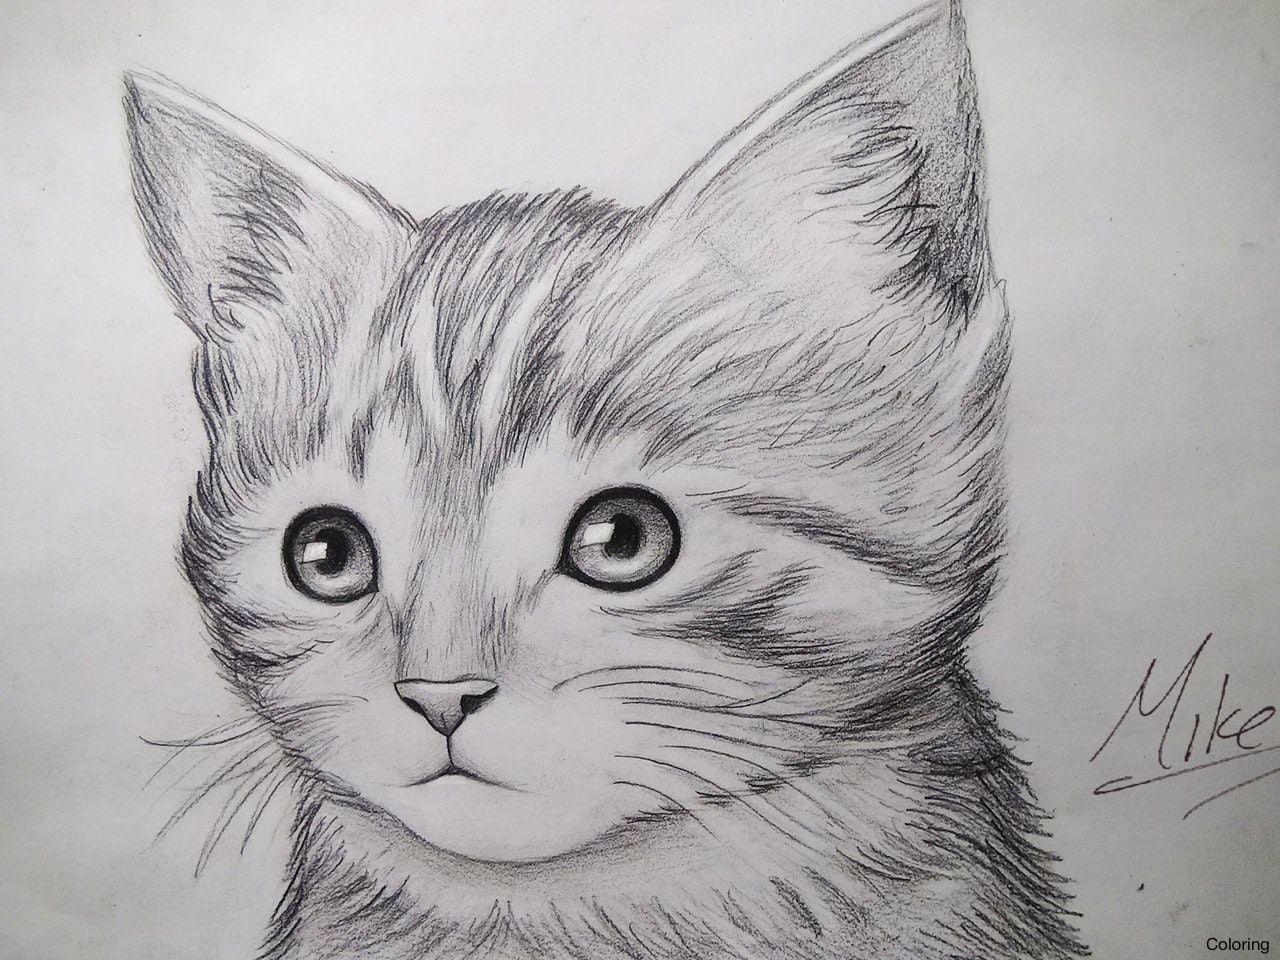 Pencil Drawings Of Kittens Drawing Artisan 1 Coloring 11f Coloring